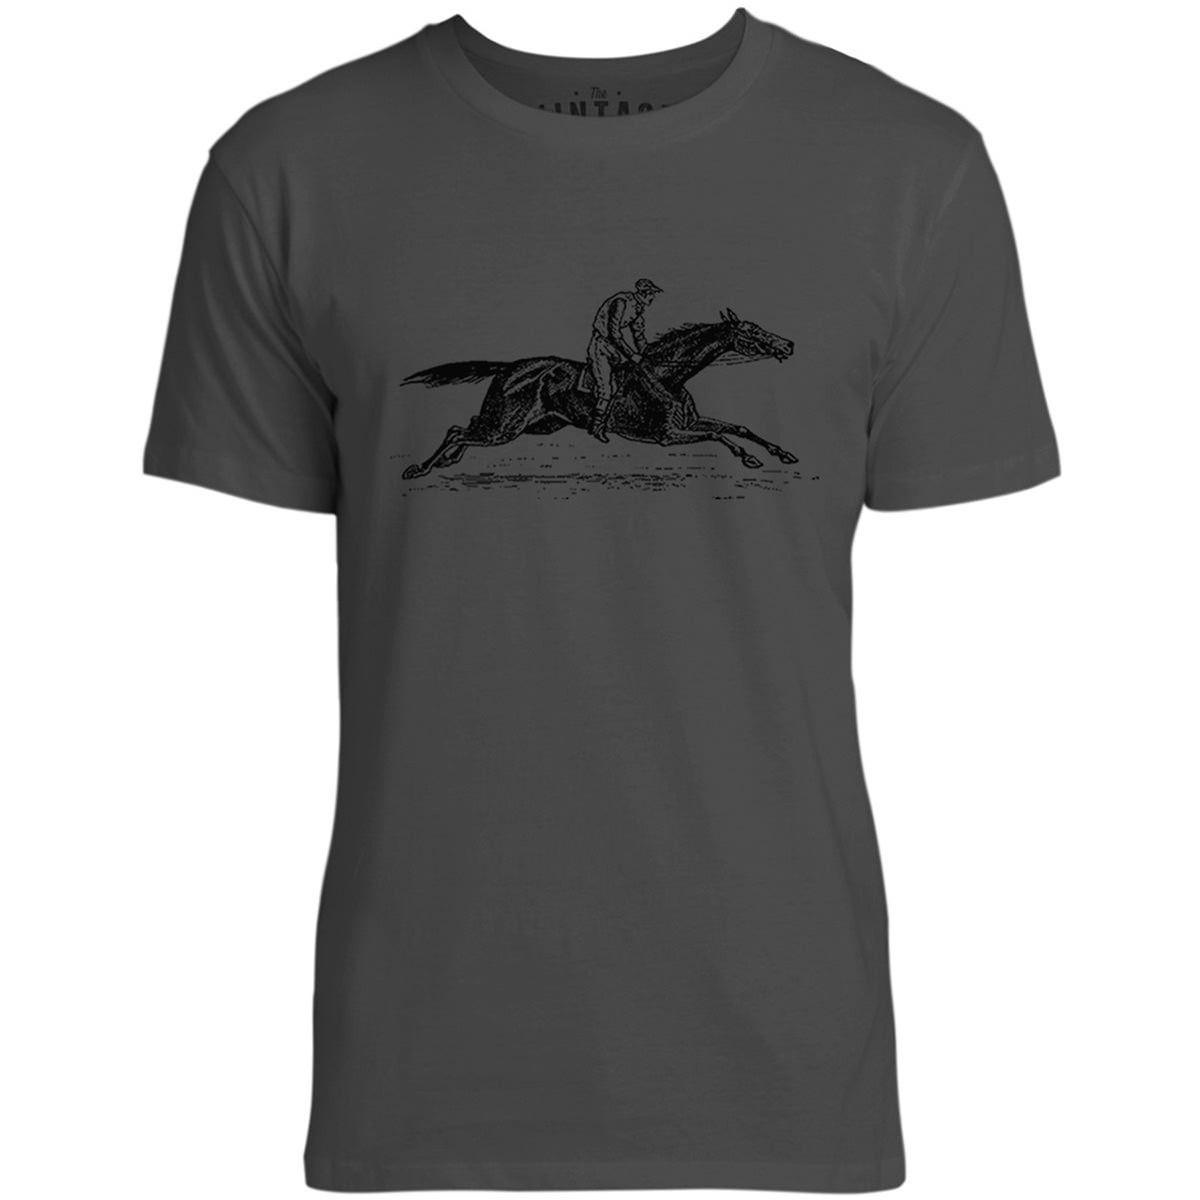 Mintage Vintage Race Horse Mens Fine Jersey T-Shirt (Vintage Black)